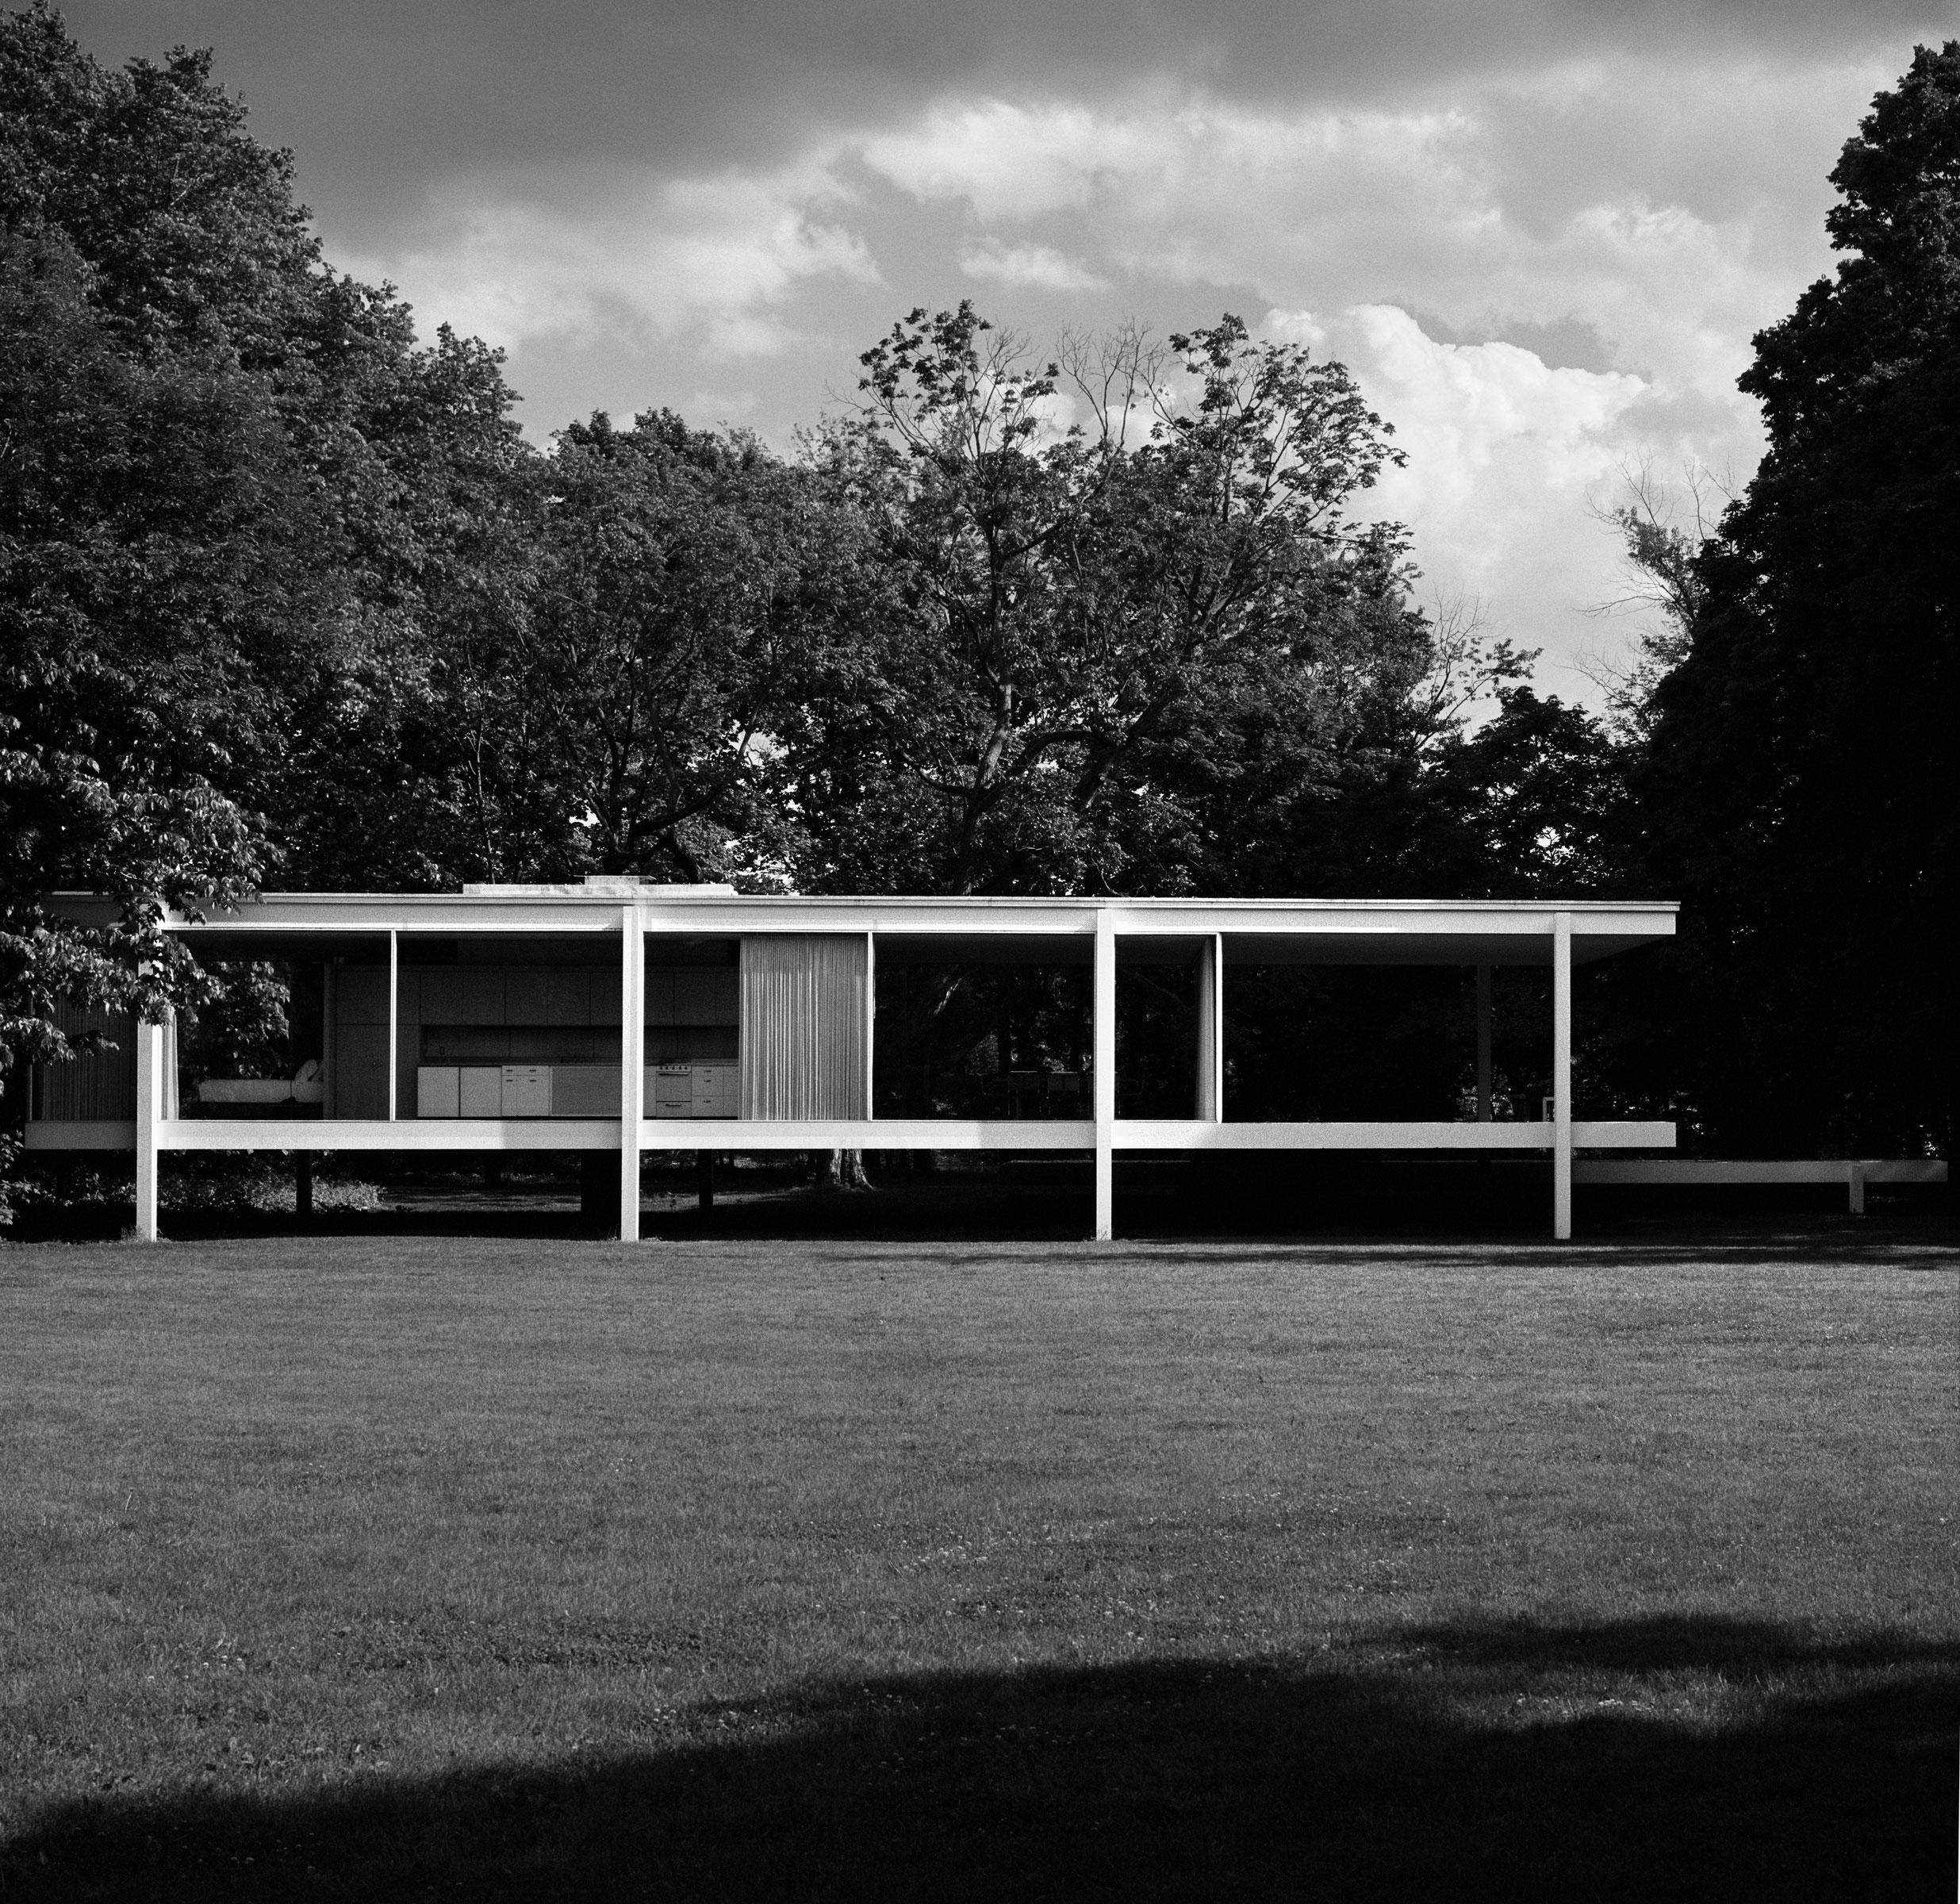 LUDWIG MIES VAN DER ROHE / Farnsworth House / 2008